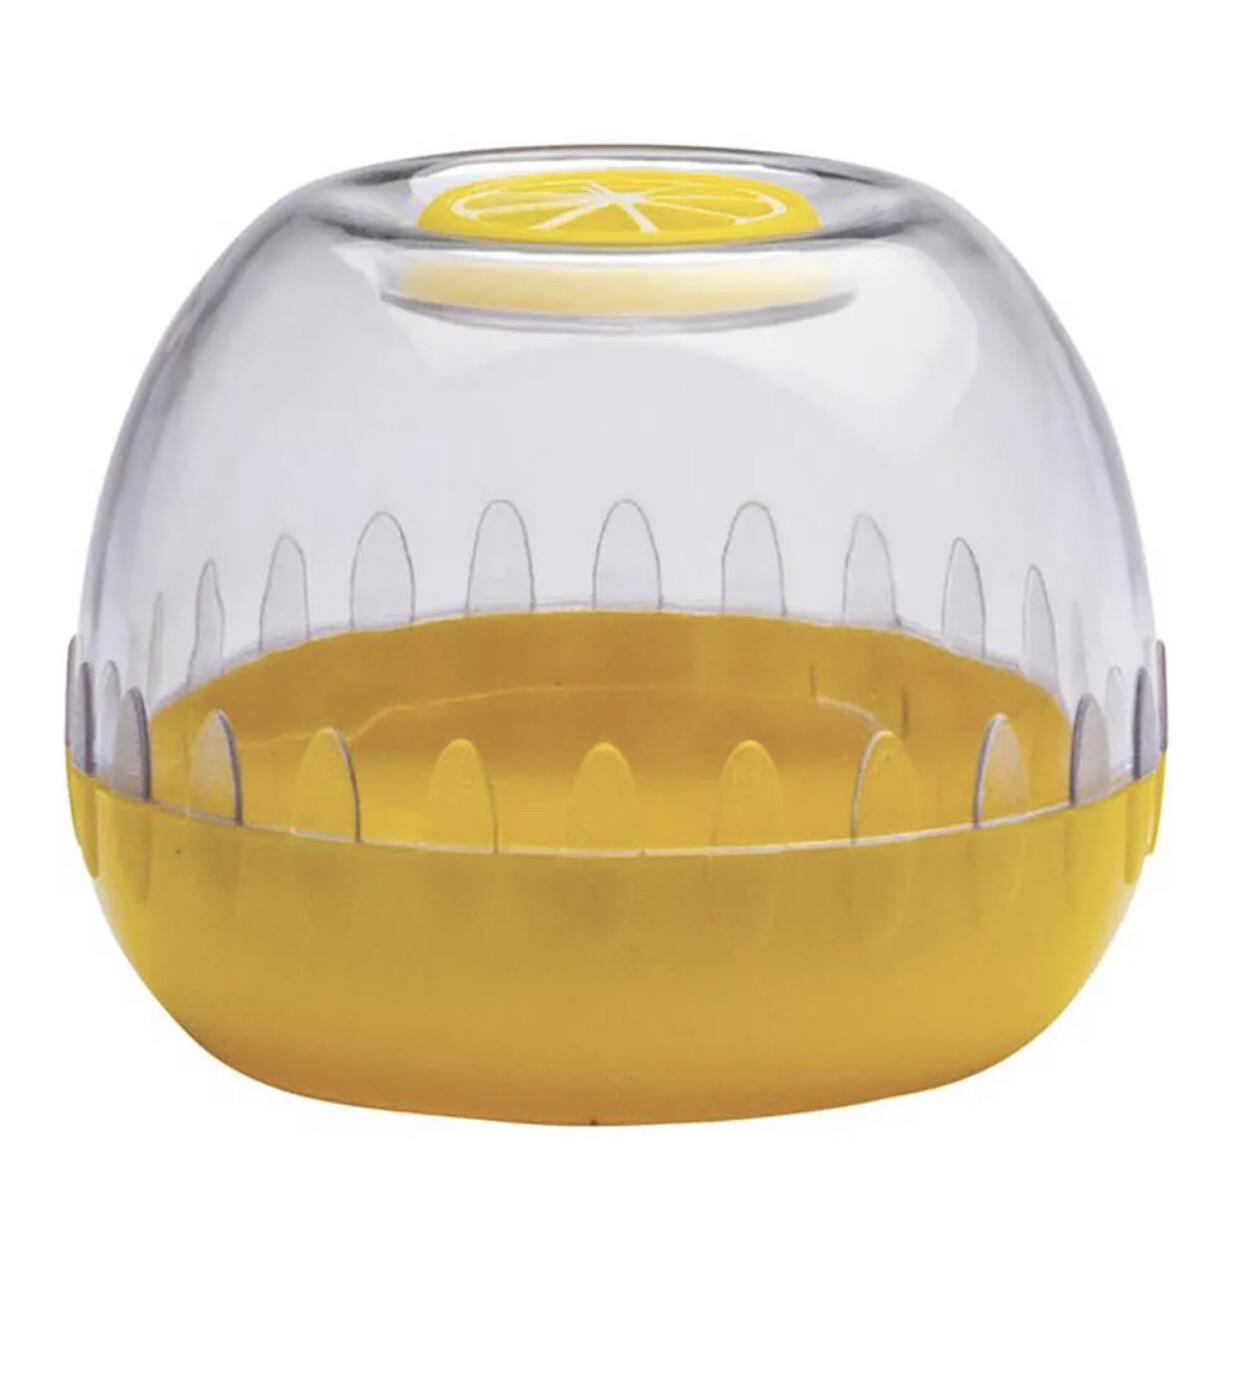 Cuisena Fresh Keeper Pod - Citrus